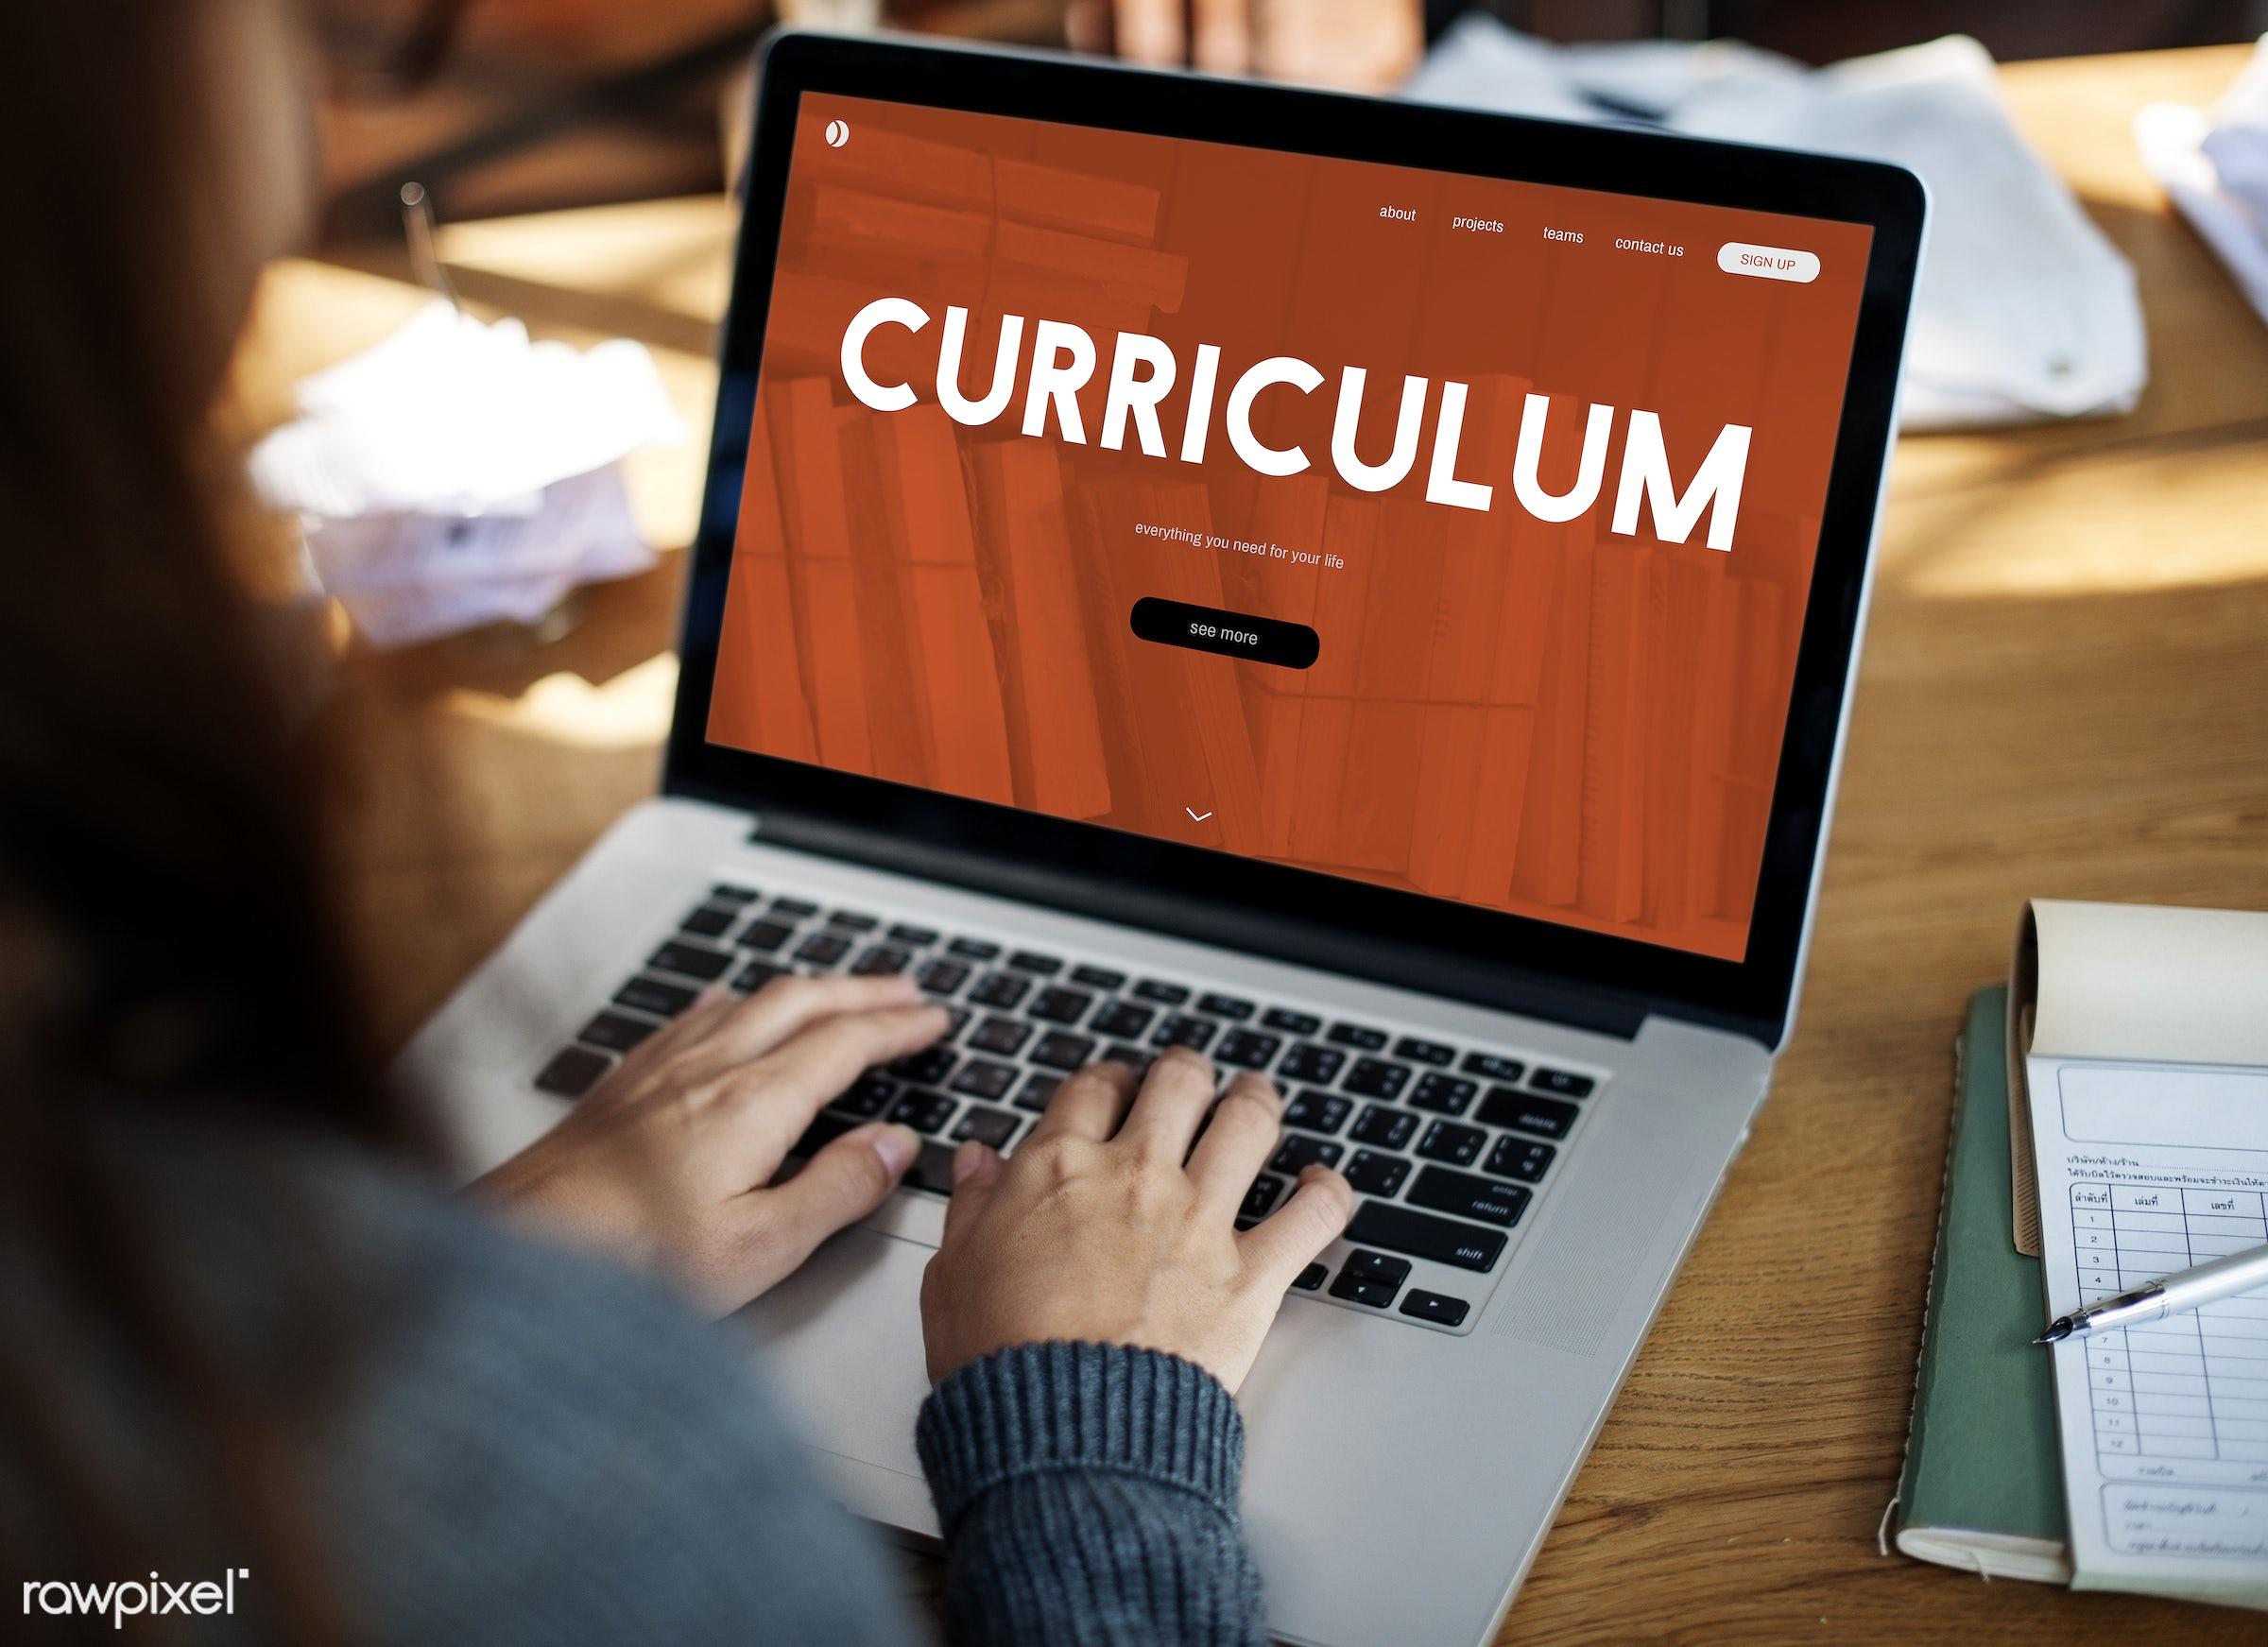 academics, browsing, case, class, course, curriculum, device, digital, digital device, distance, education, hands, institute...